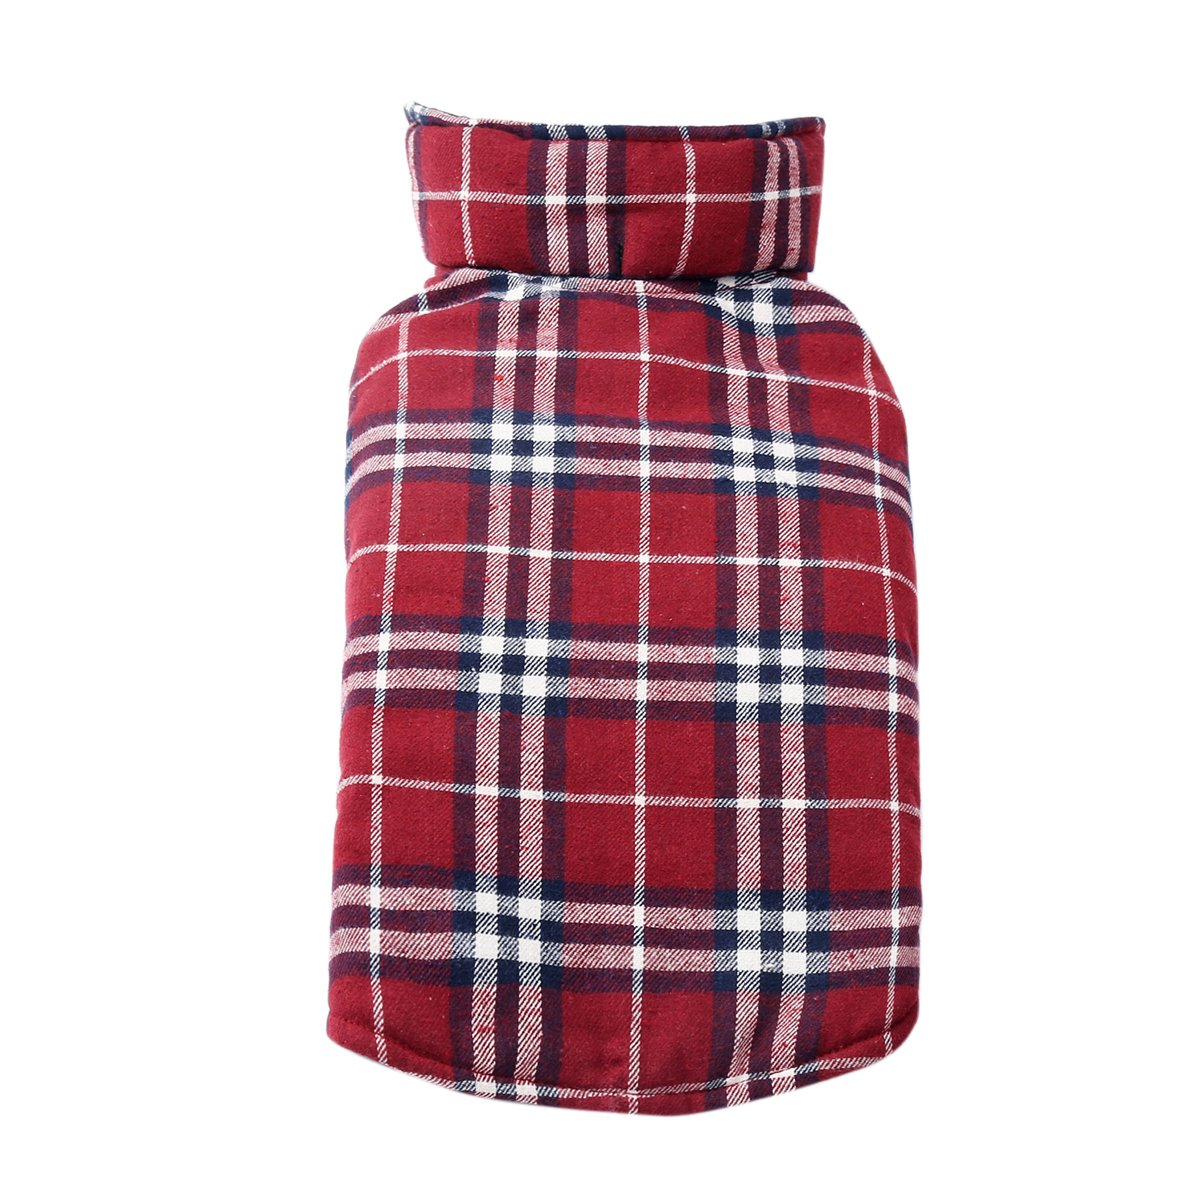 RED1 Medium RED1 Medium Adorrable Windproof Reversible Pet Coat Cozy Cats Winter Verlco Fleece Patterned Dog Coats, Red, Medium